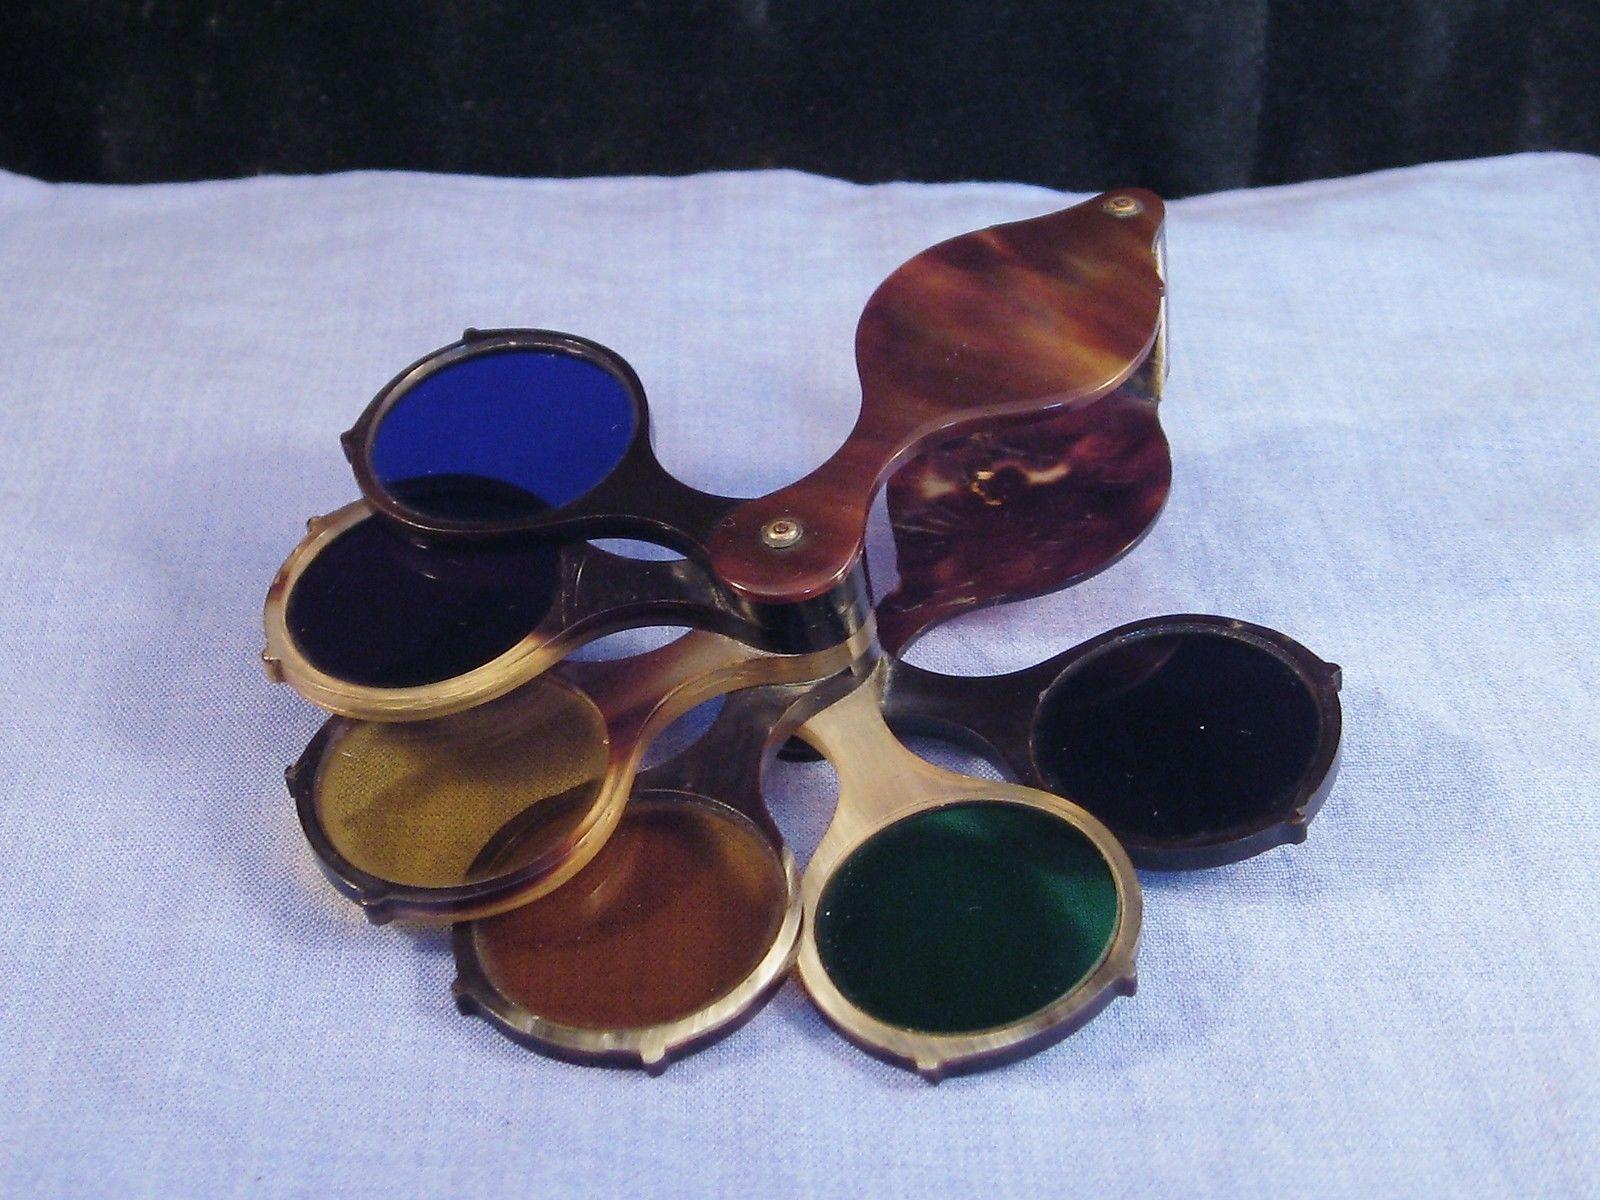 VICTORIAN ARTISTS CLAUDE LORRAIN POCKET GLASS FILTERS LOUPE - Artist creates art power sunlight magnifying glass